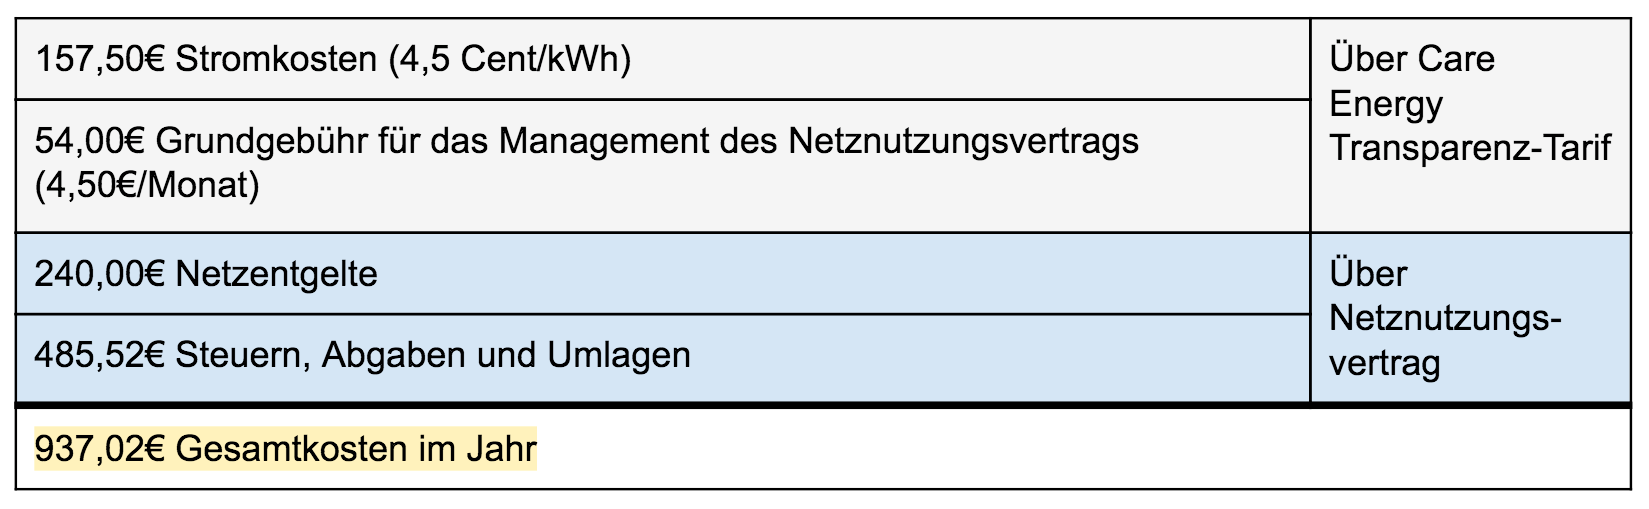 Care-Energy Transparenz-Tarif Rechnung